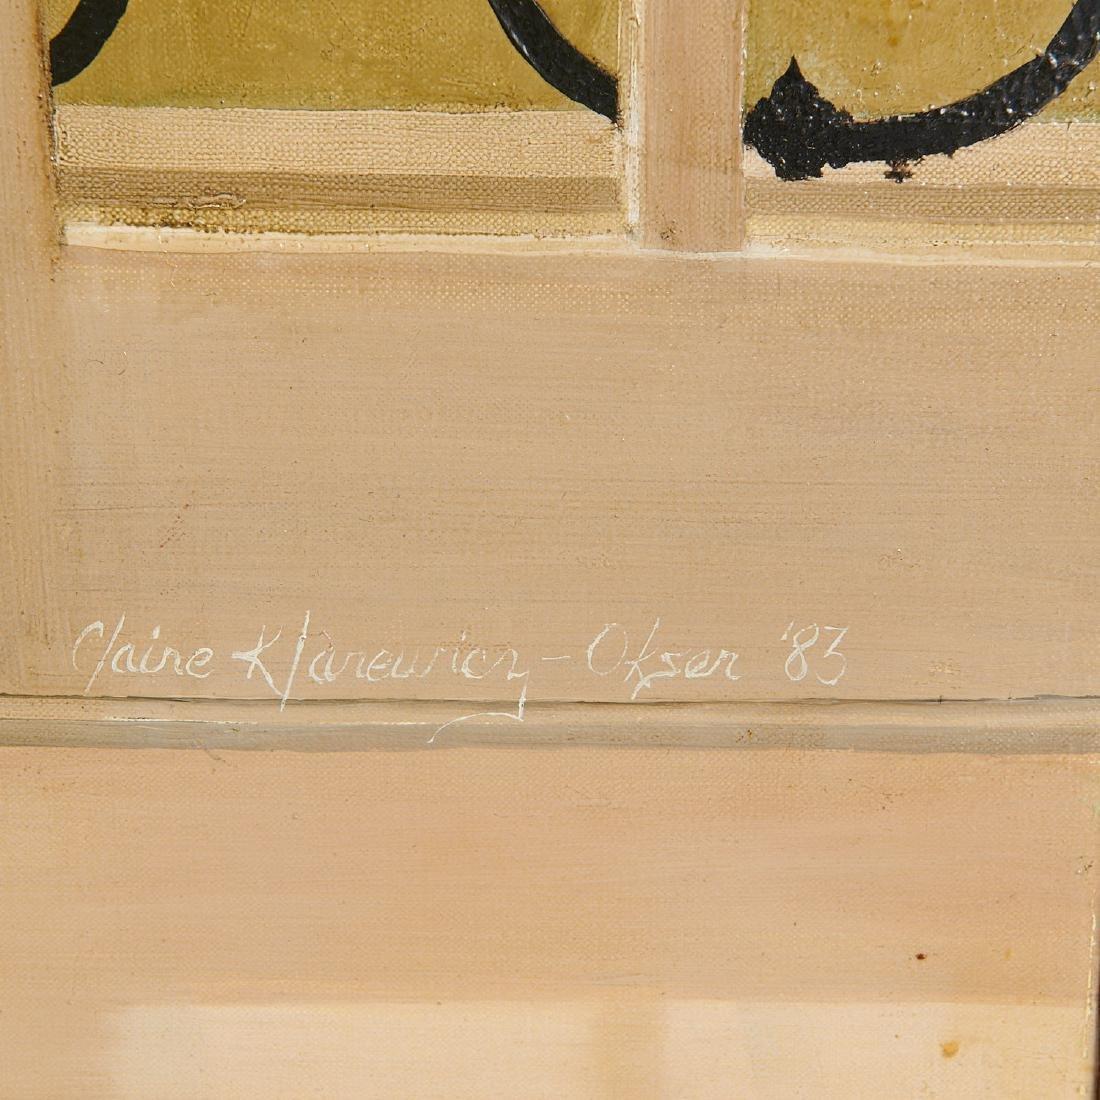 Claire Klarewicz-Okser, large scale painting, 1983 - 9